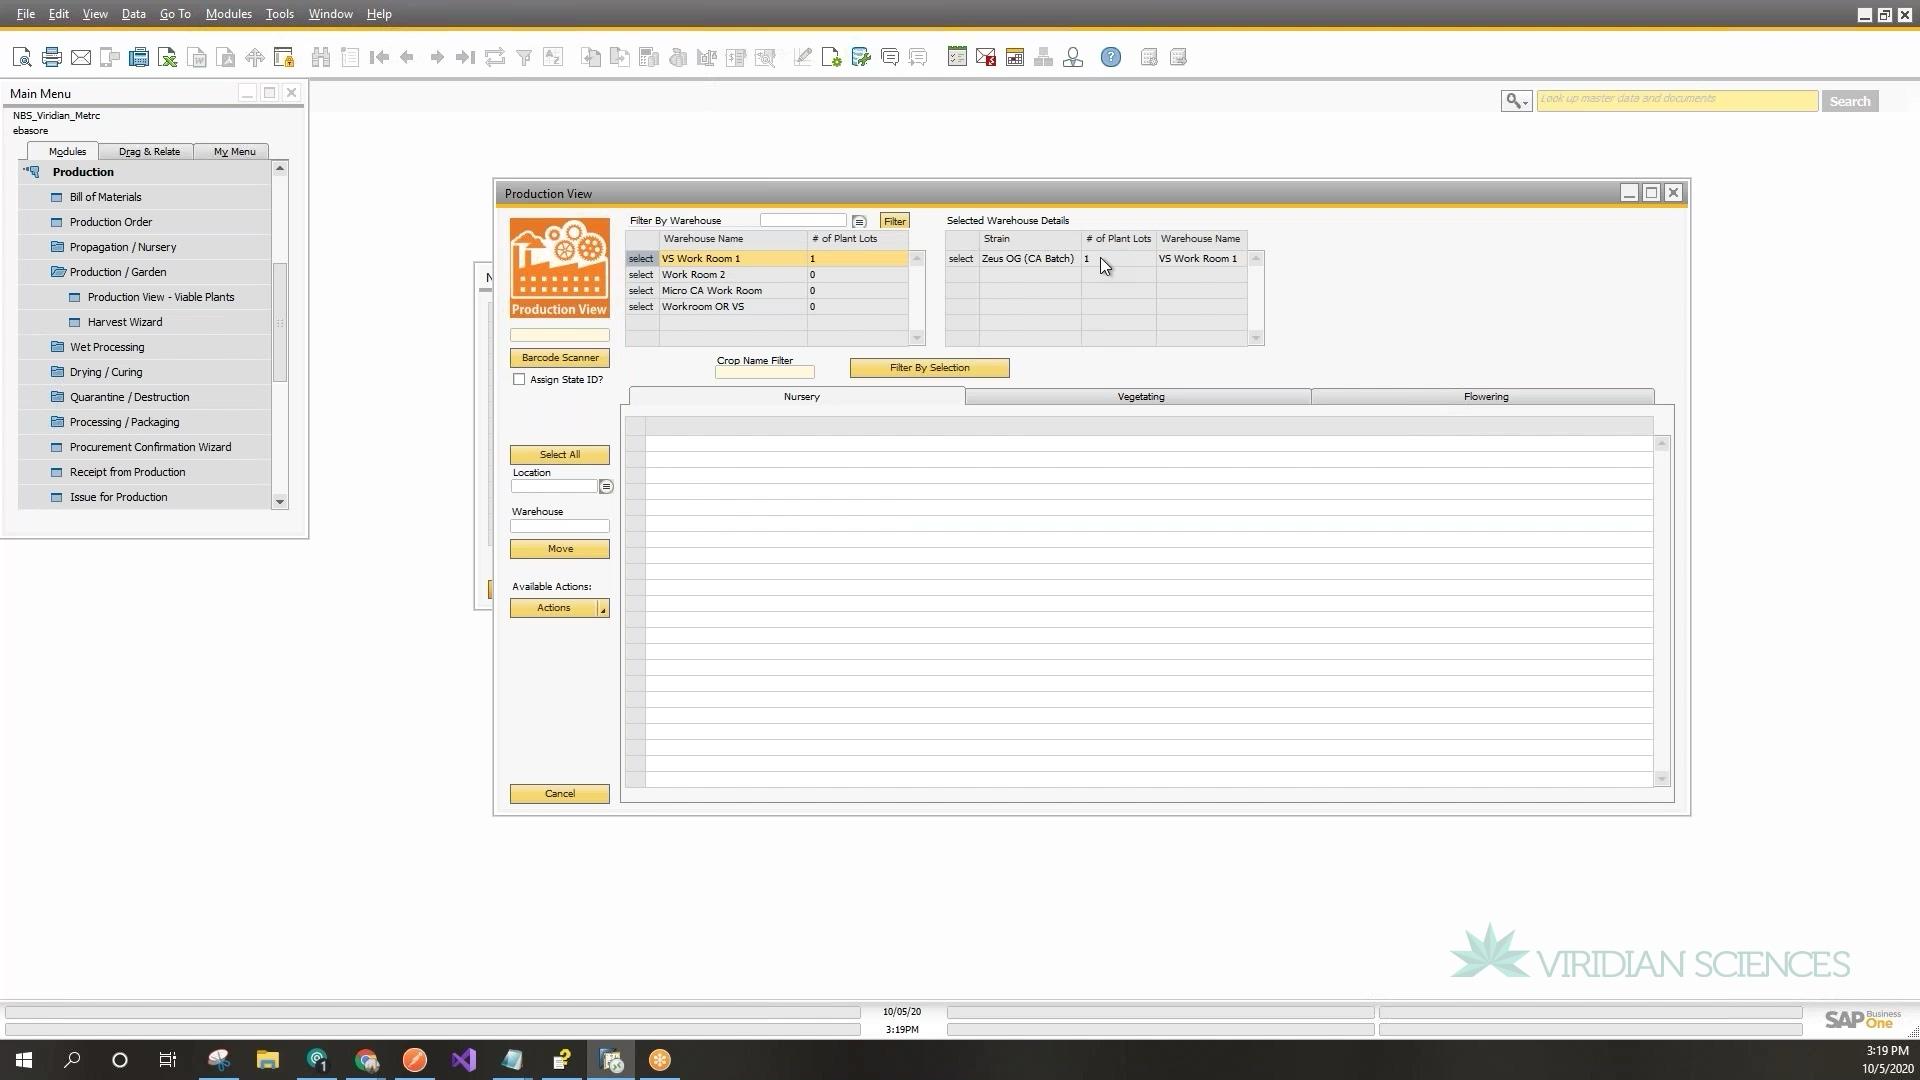 Plant Batch Management_overview_8Oct2020_final